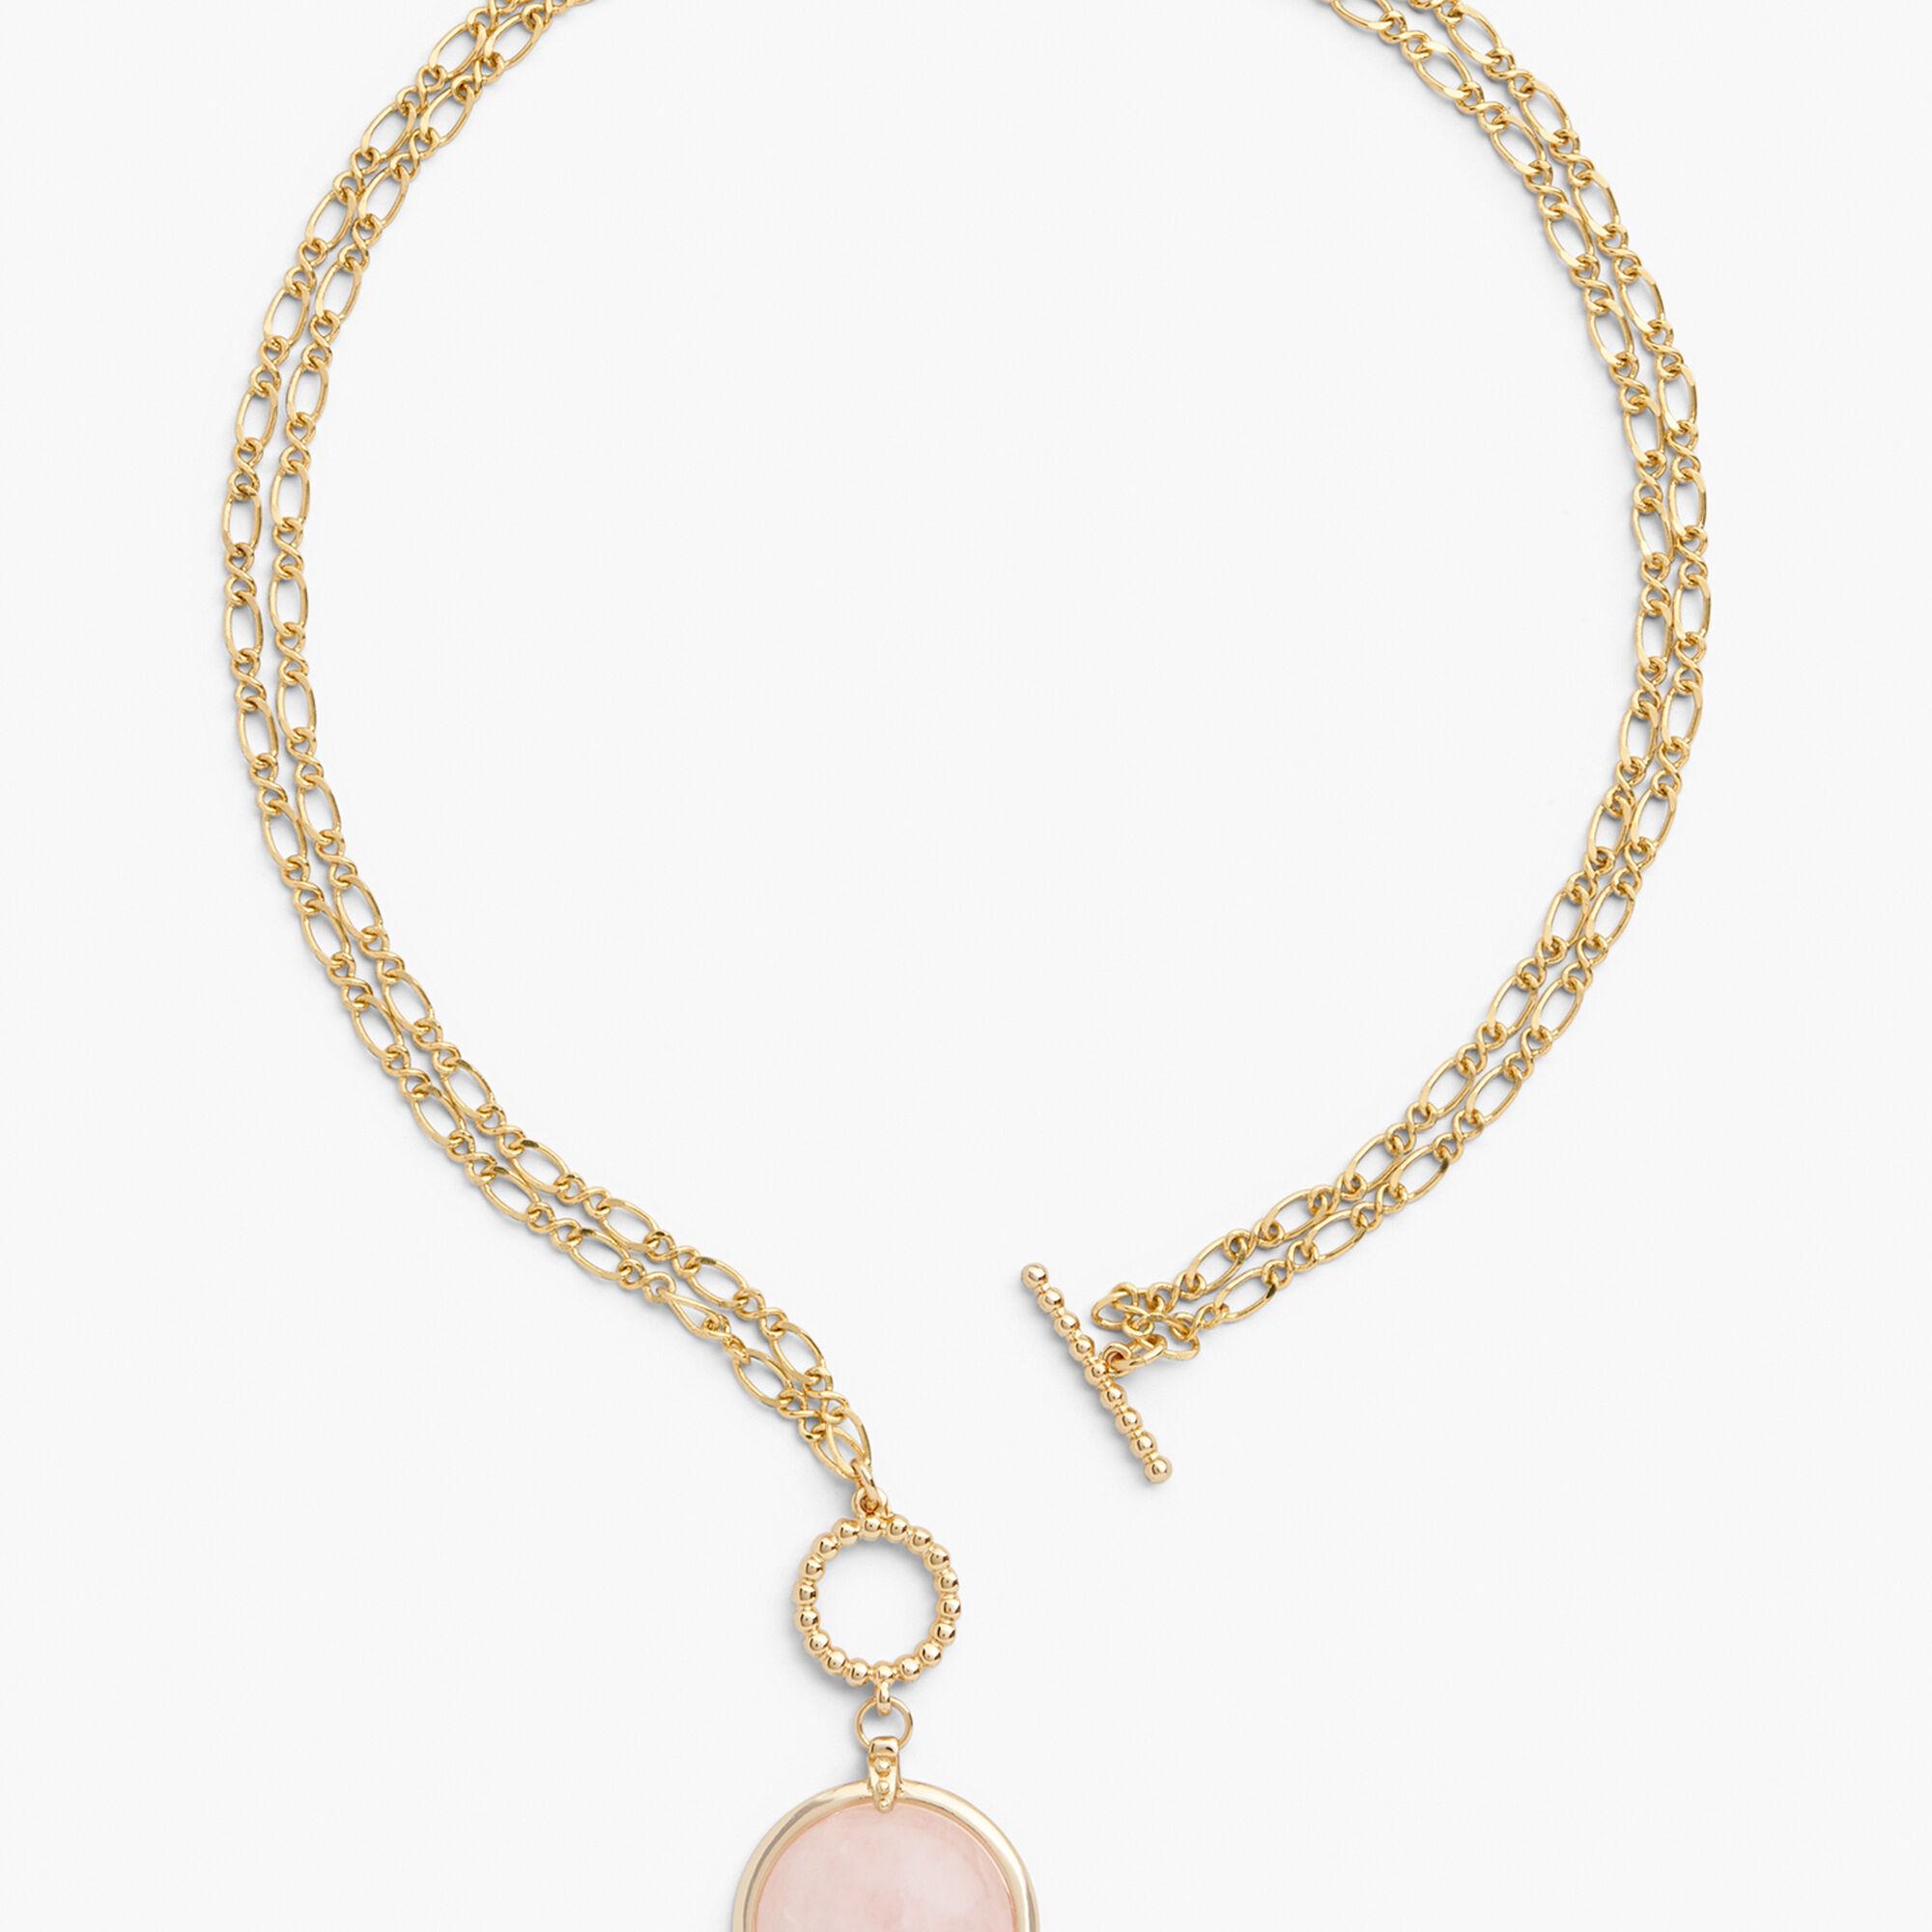 f08c72189b5ec9 Rose Quartz Pendant Necklace - Image Of Necklace